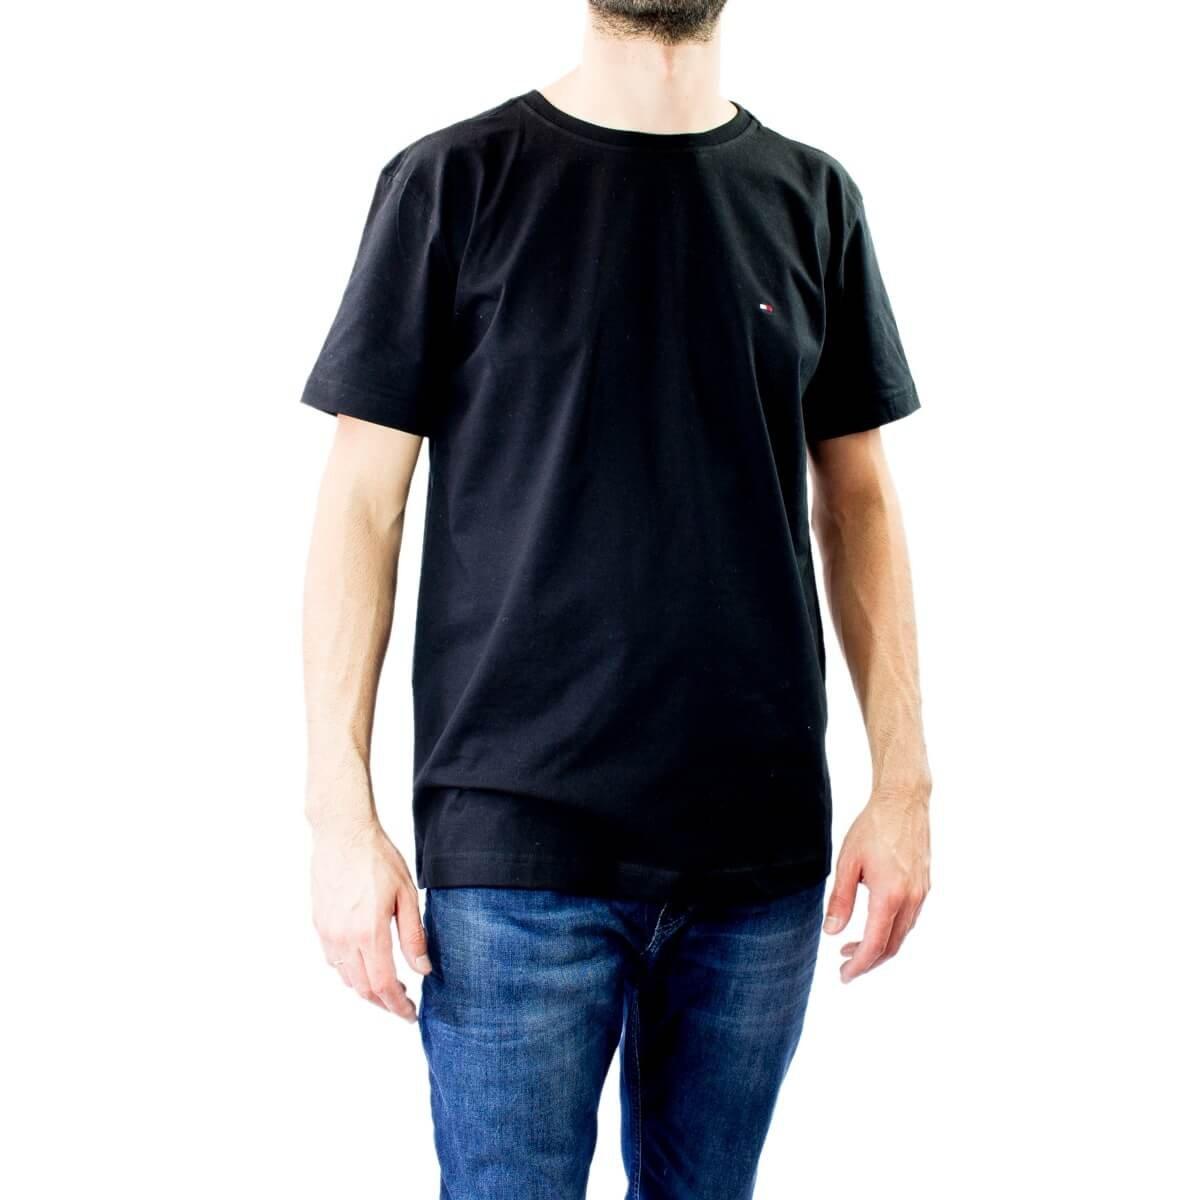 1bd4ae300cf23 Bizz Store - Camiseta Masculina Gola Redonda Tommy Hilfiger